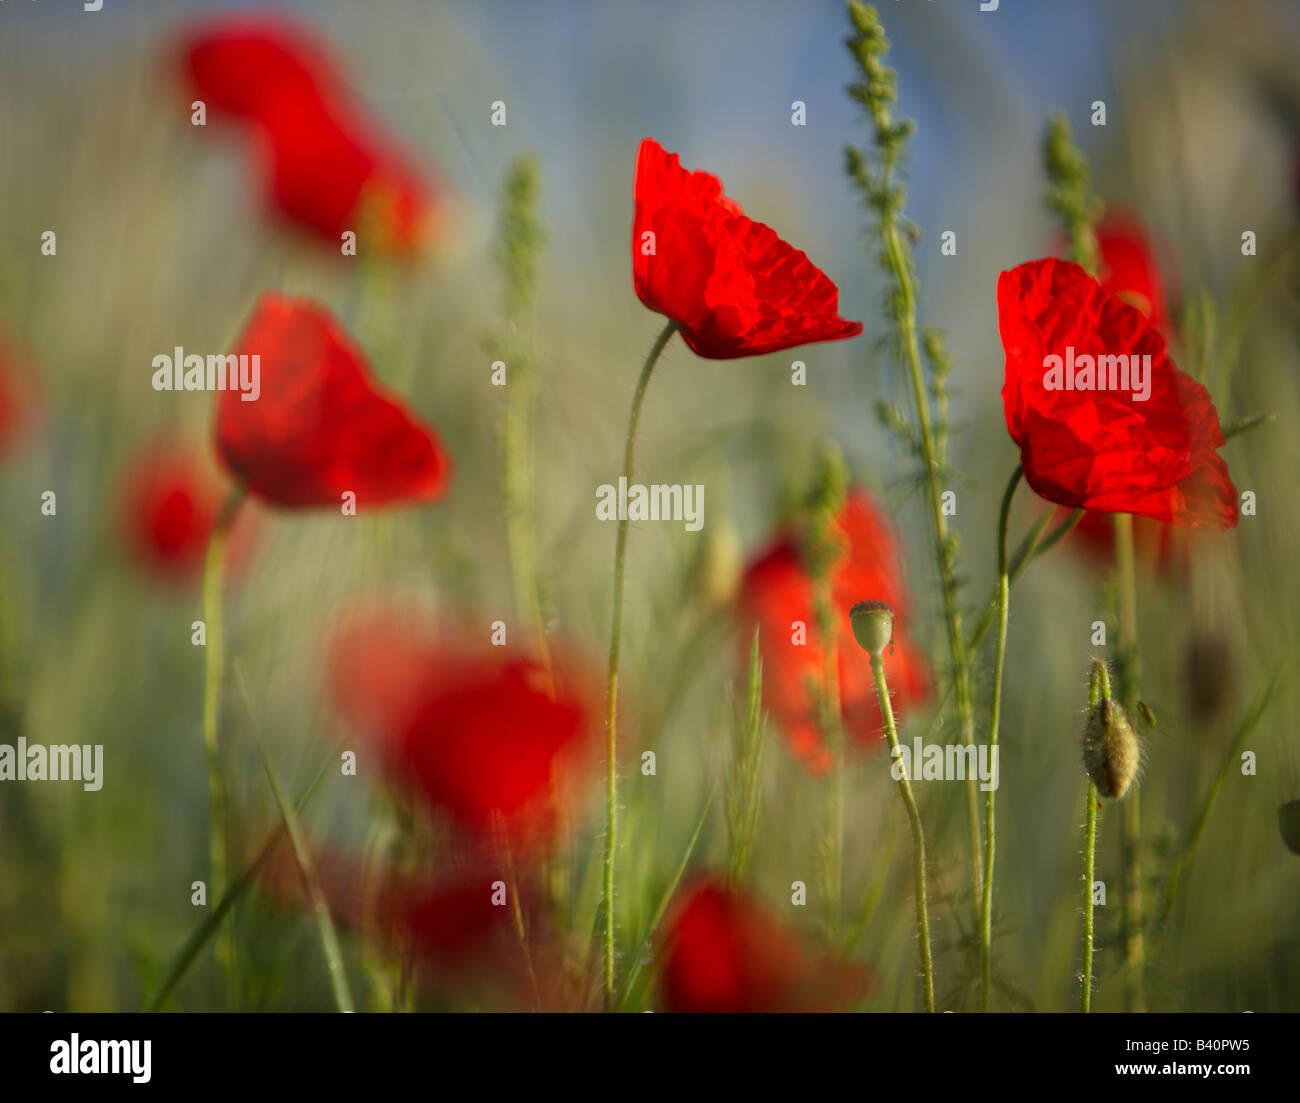 poppies in the Valnerina, Umbria, Italy - Stock Image